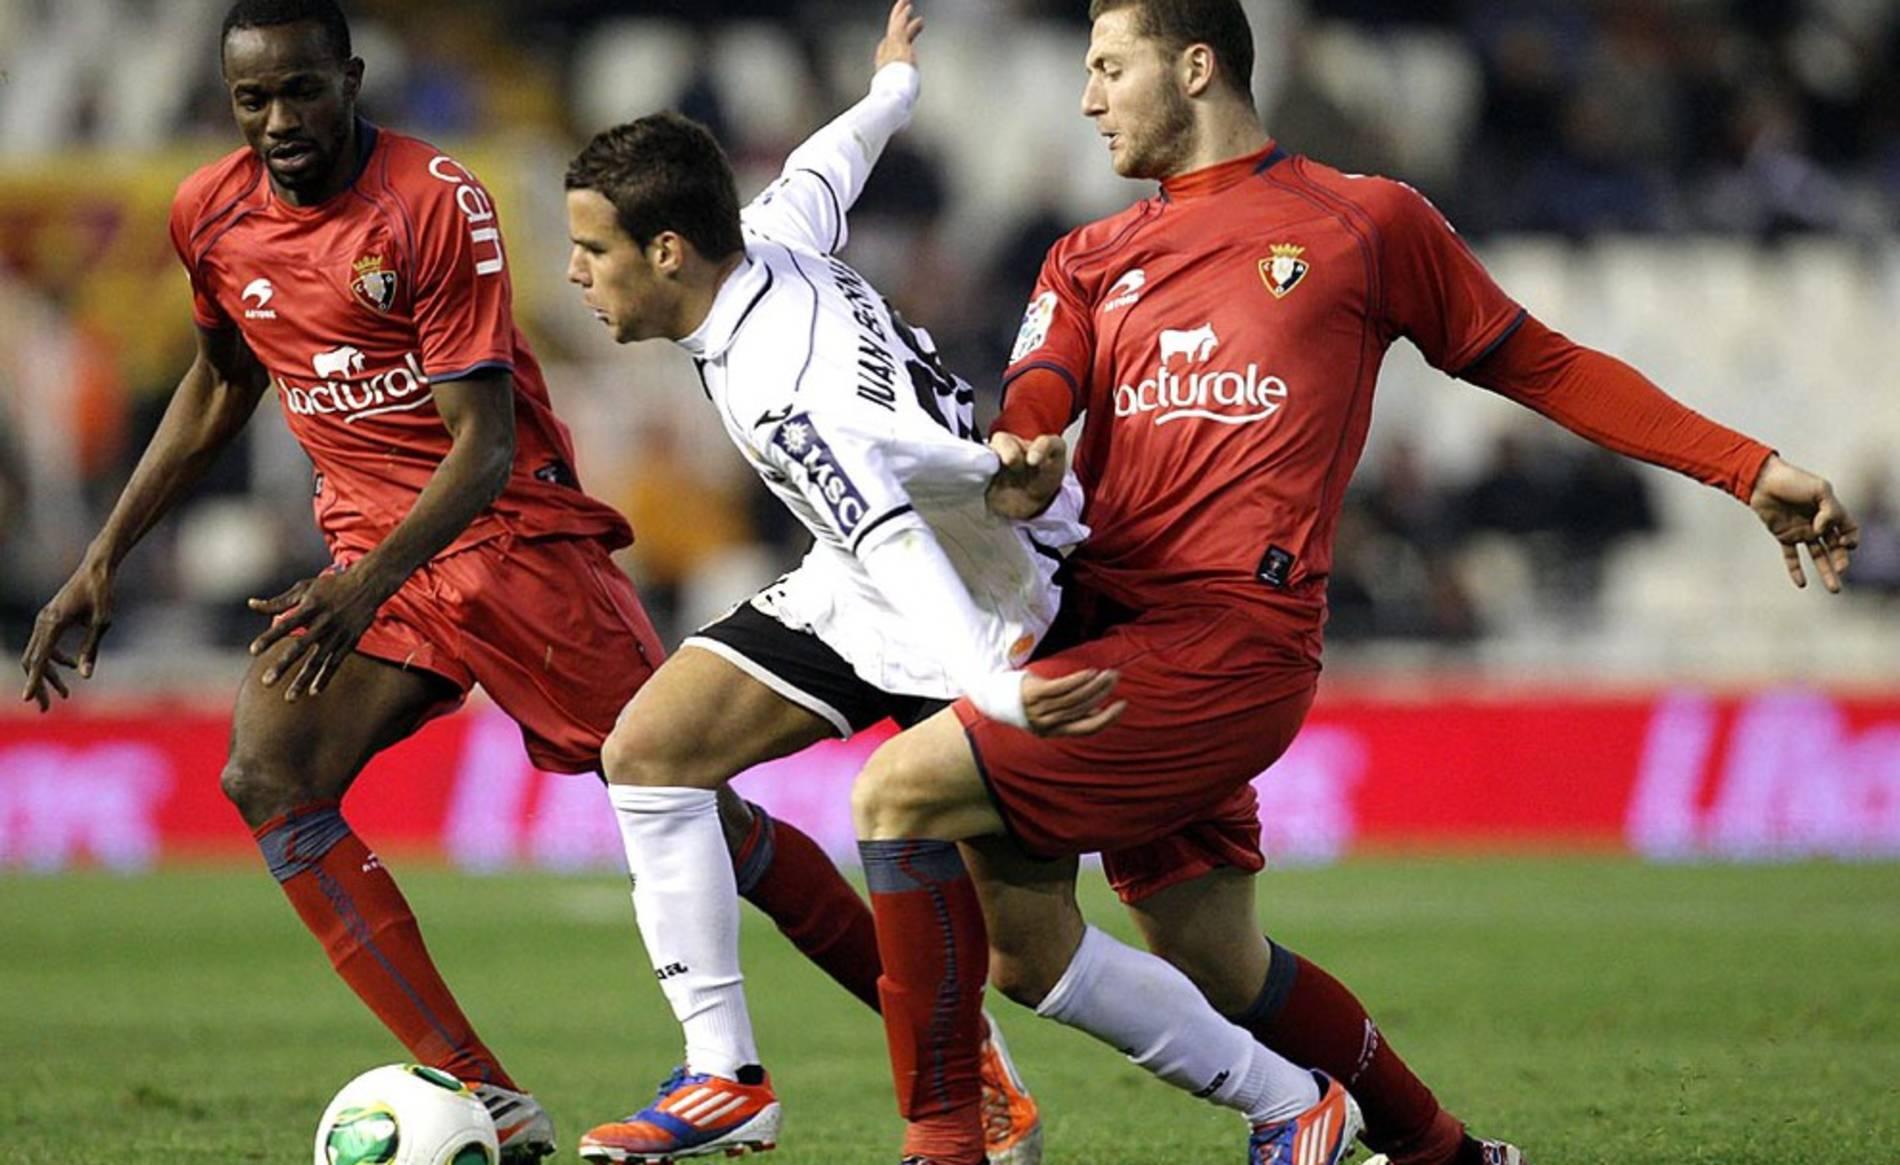 08.01.2013: Valencia CF 2 - 1 CA Osasuna